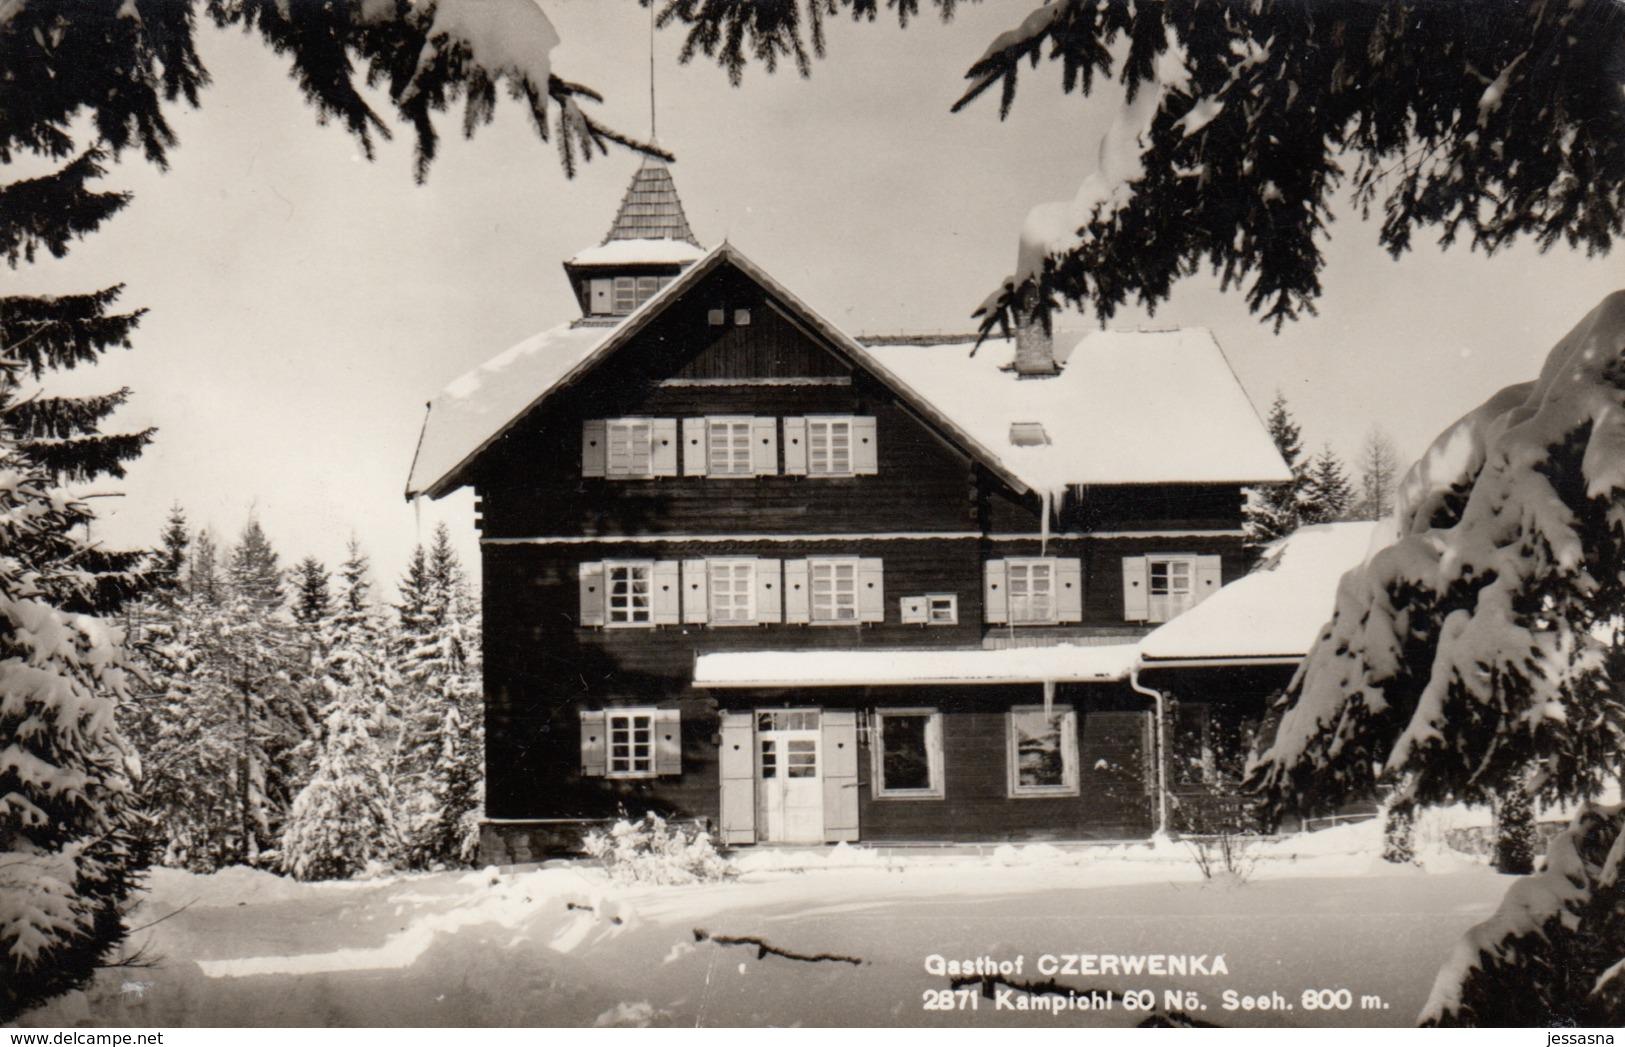 AK - NÖ - KAMPICHL - Gasthof CZERWENKA - Neunkirchen